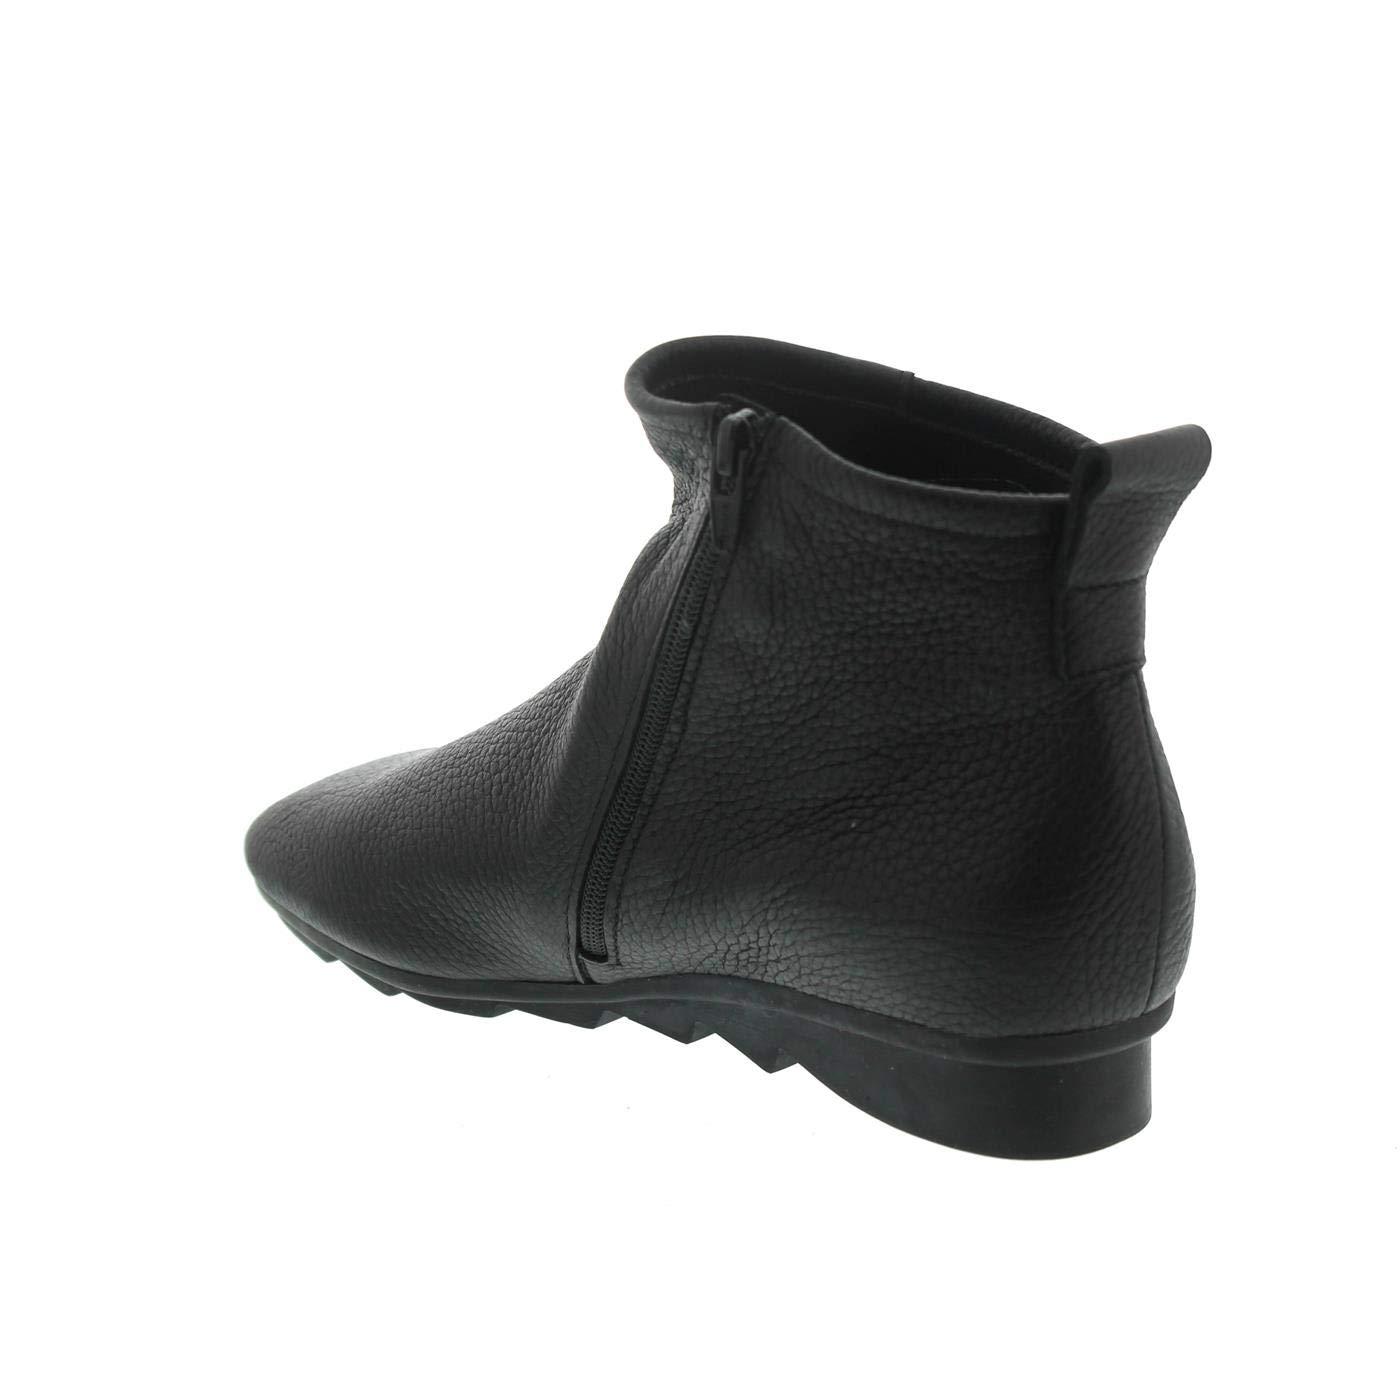 e85622f8920fcc amp  Bibiki Schuhe Noir Handtaschen Stiefelette Arche xwYZU0aqU